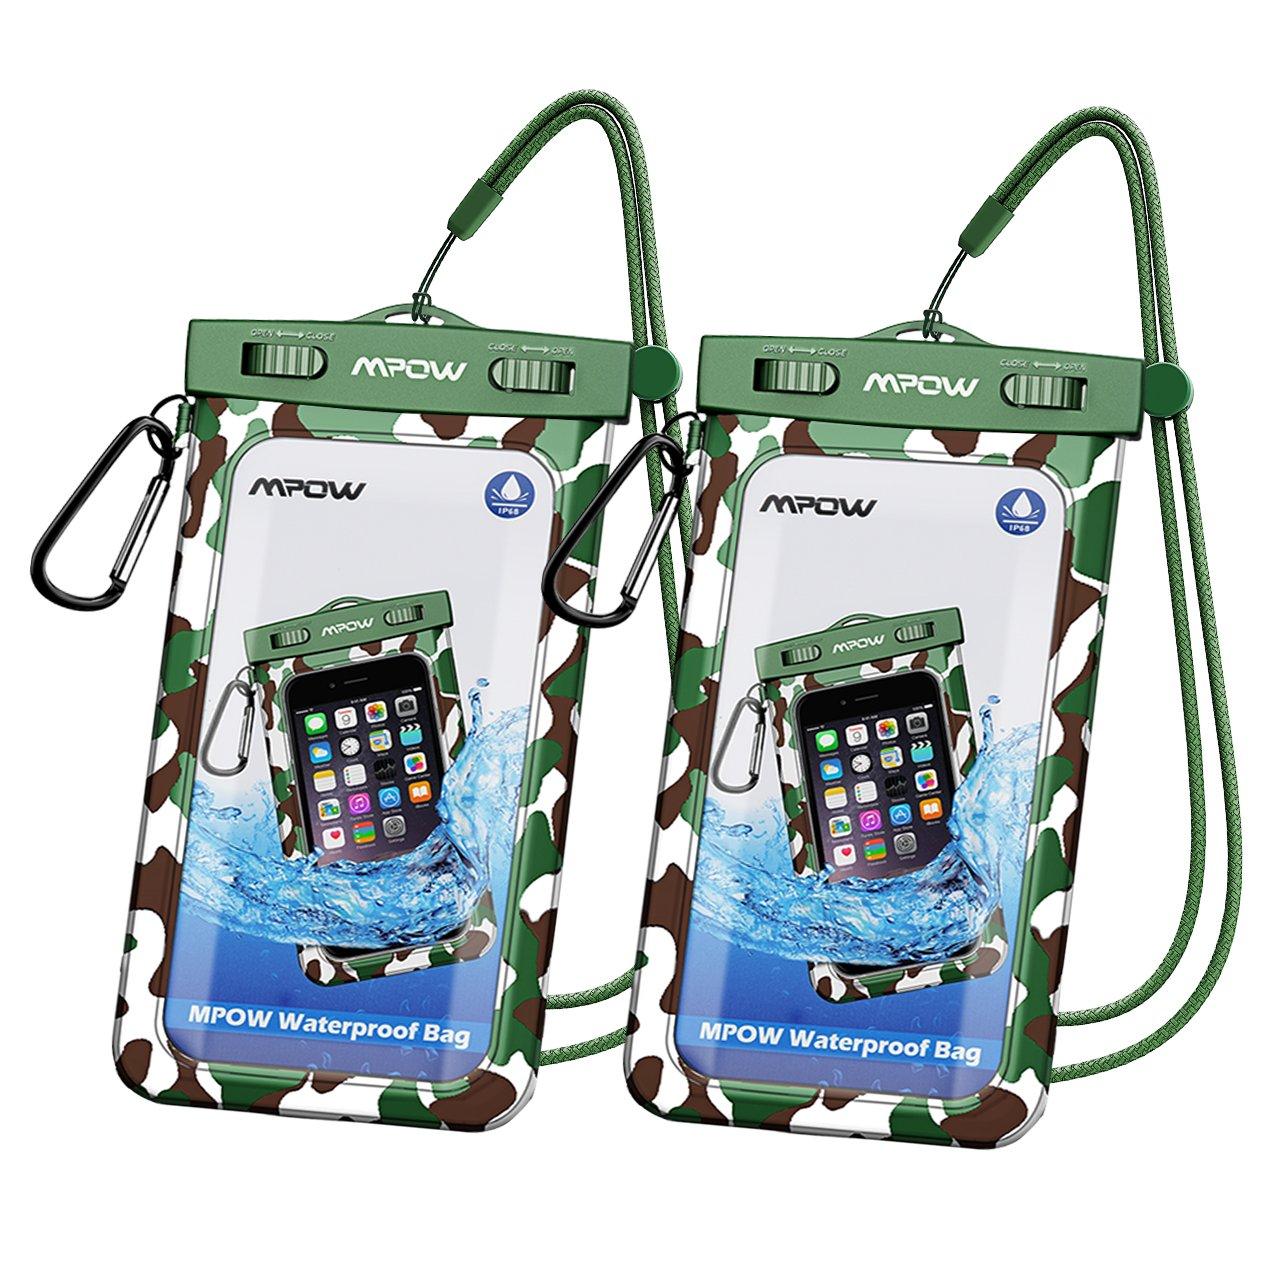 Mpowユニバーサル防水ケース、ipx8防水電話ポーチドライバッグiphone8 / 8plus / 7 / 7plus / 6s / 6 / 6s Plus Samsung Galaxy s8 / s7 Google Pixel htc10 (2 - Pack) B07BHFDK34 5.Camo